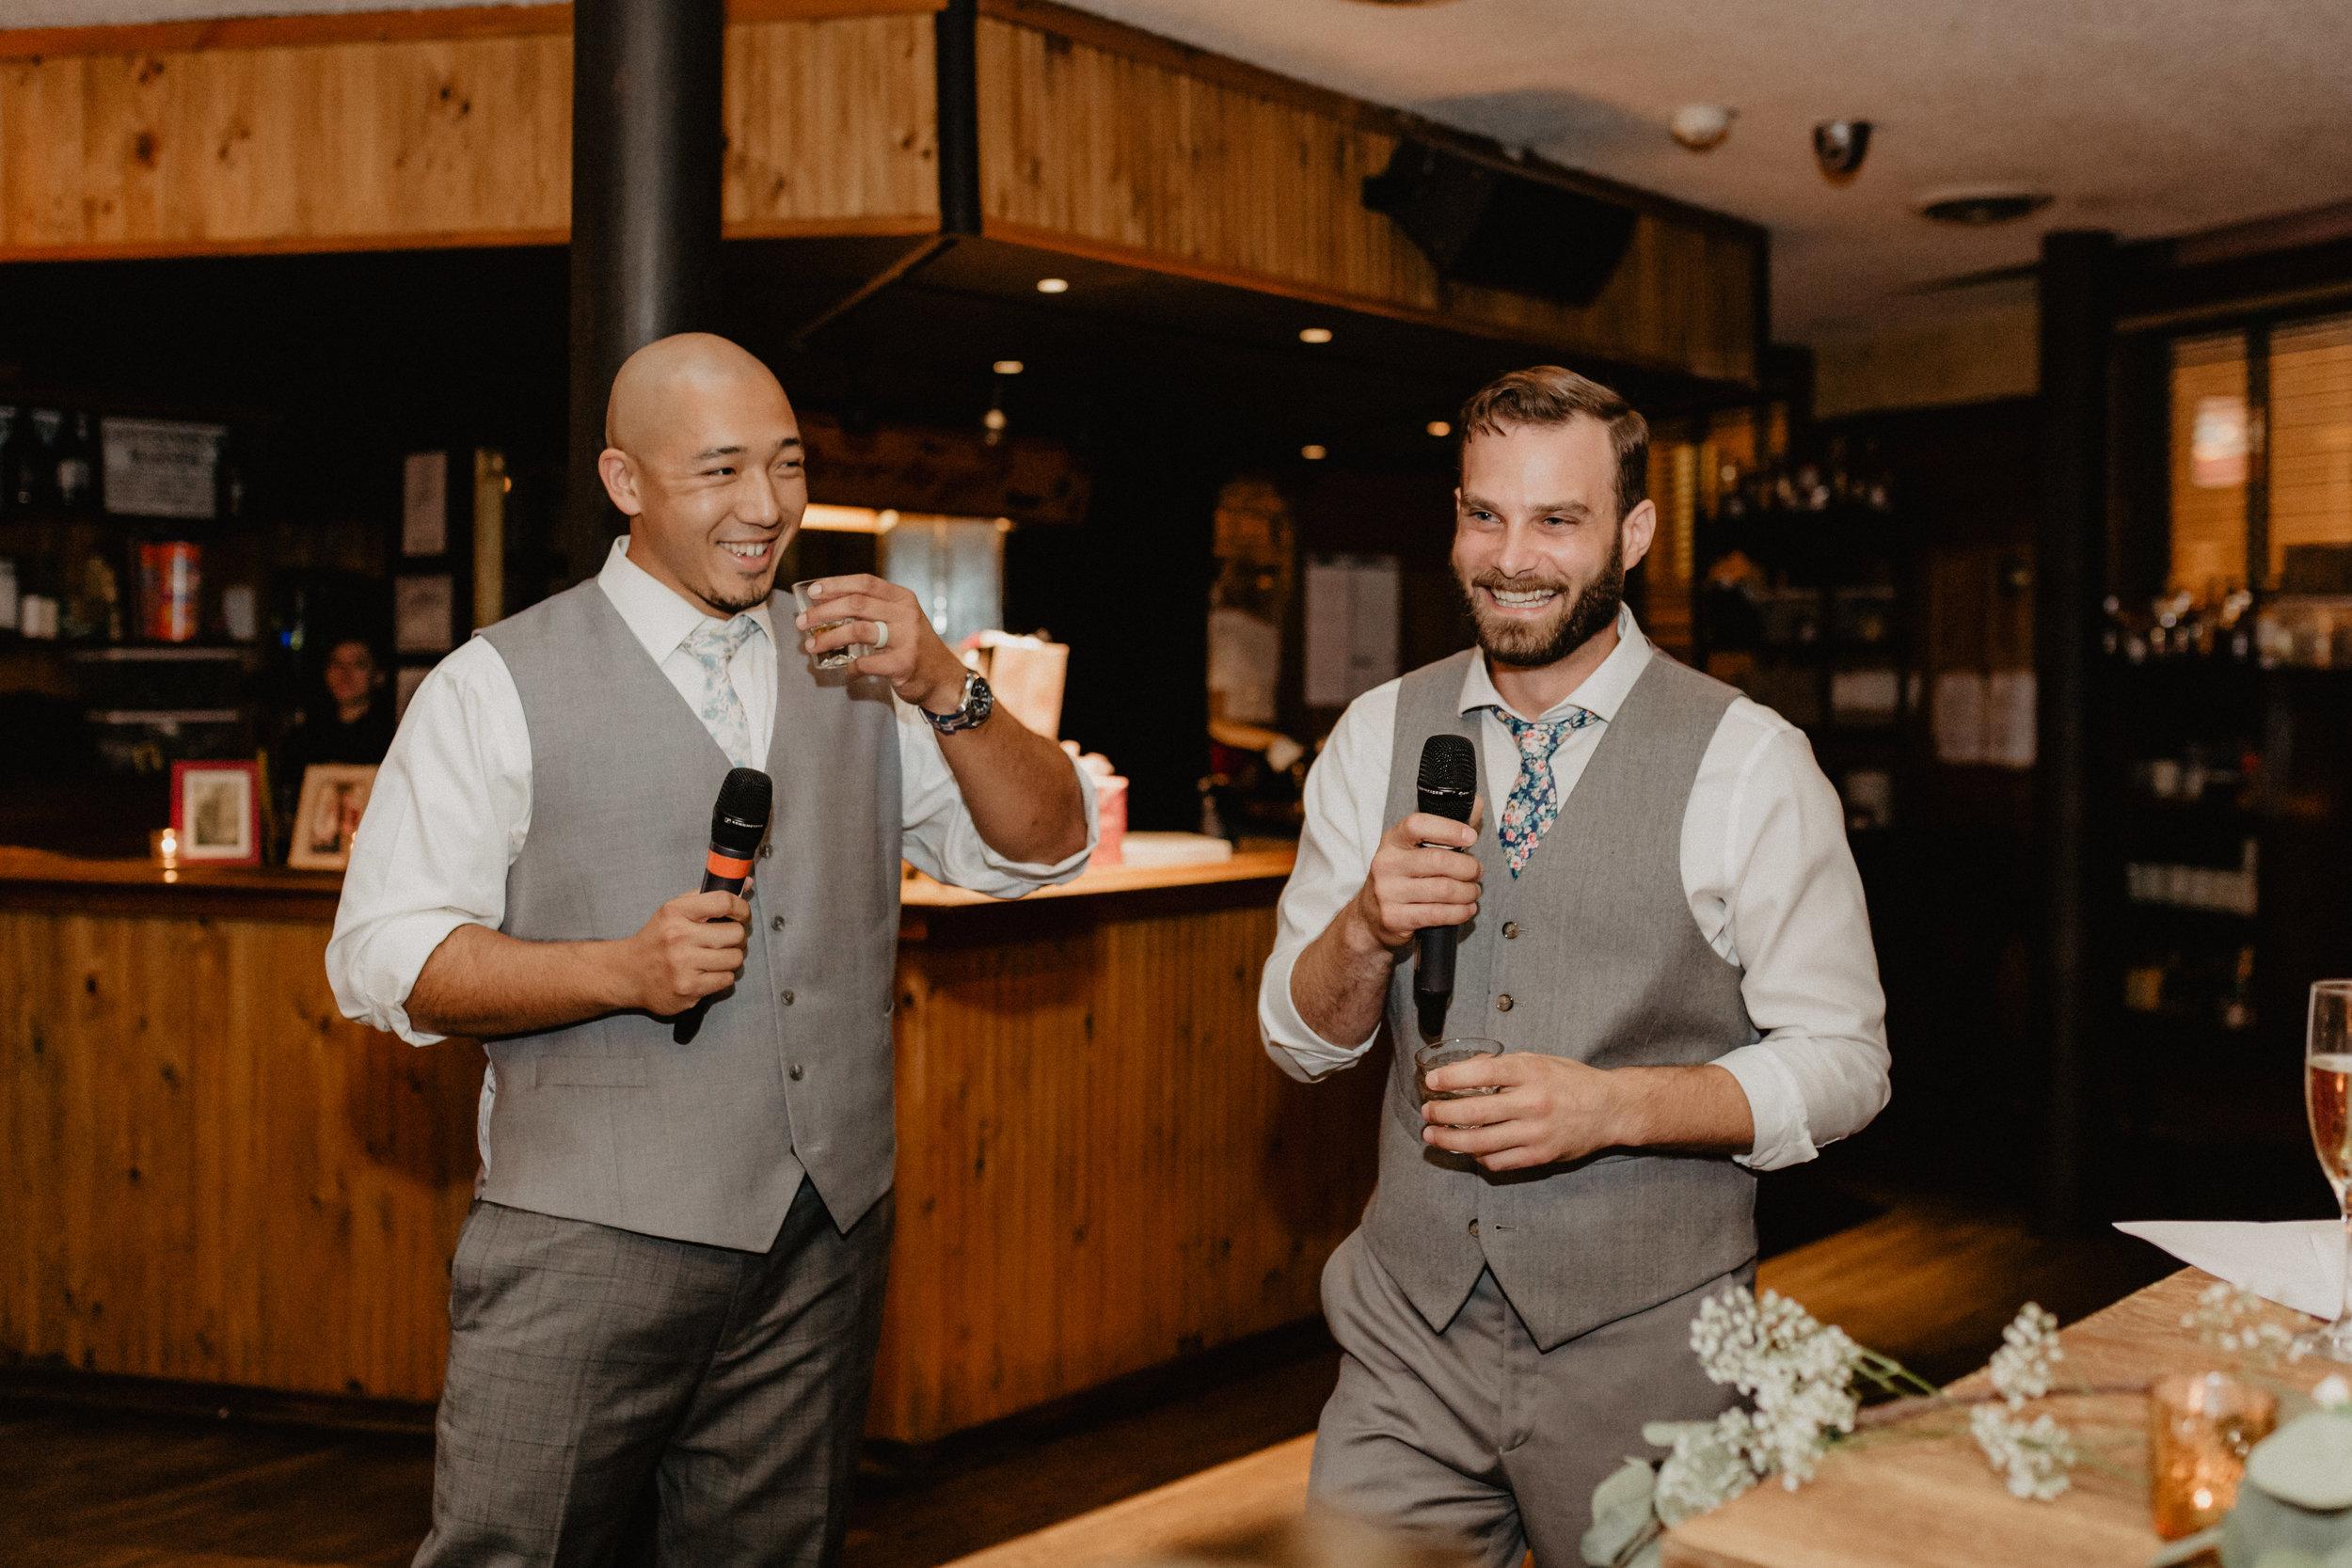 city-beer-hall-wedding-118.jpg